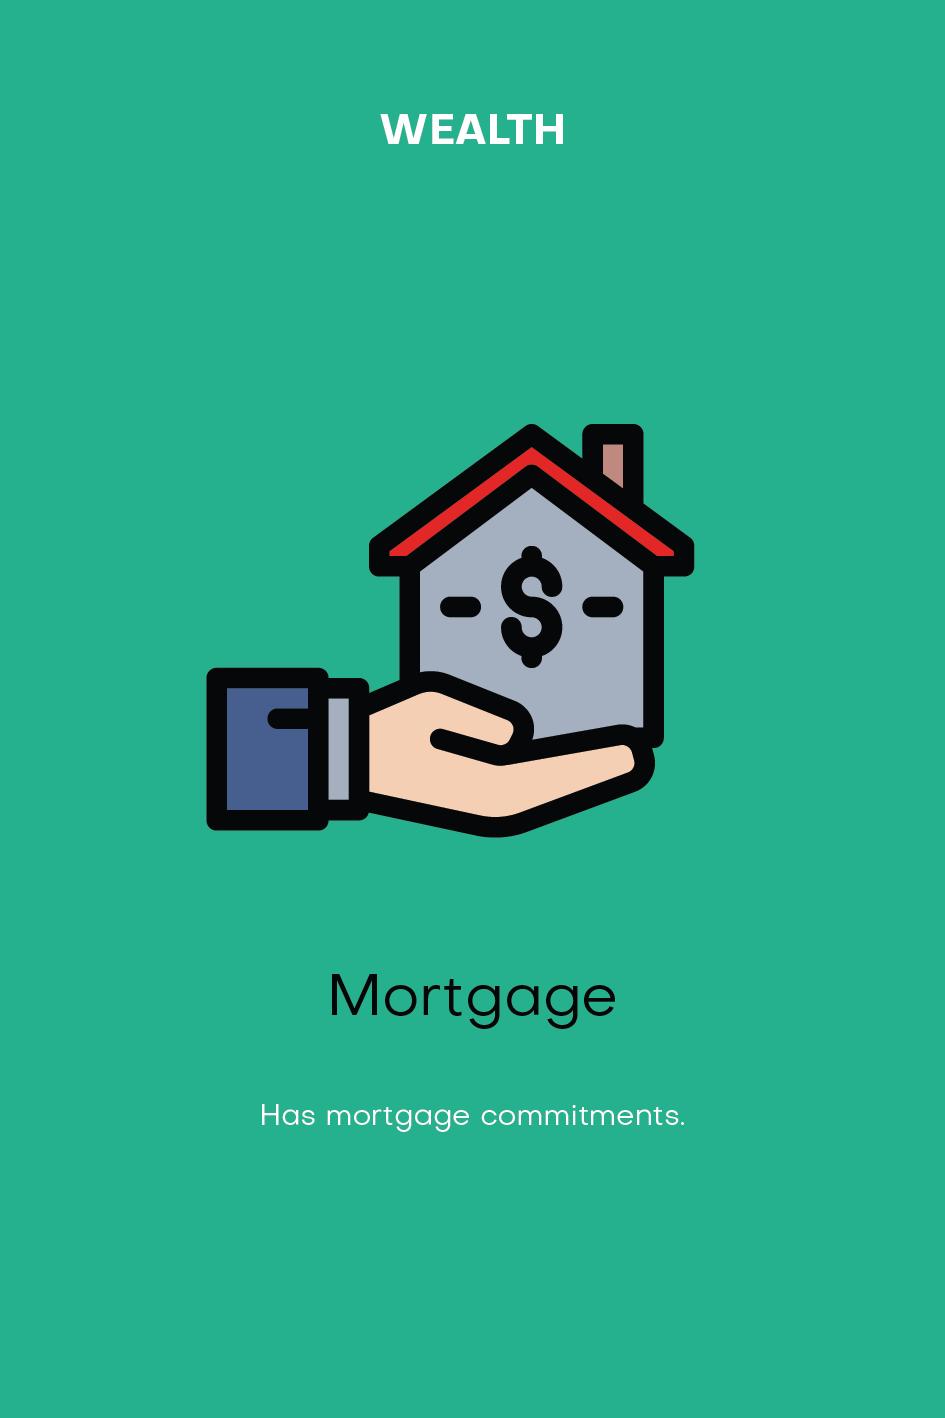 Archetype: Wealth, Mortgage